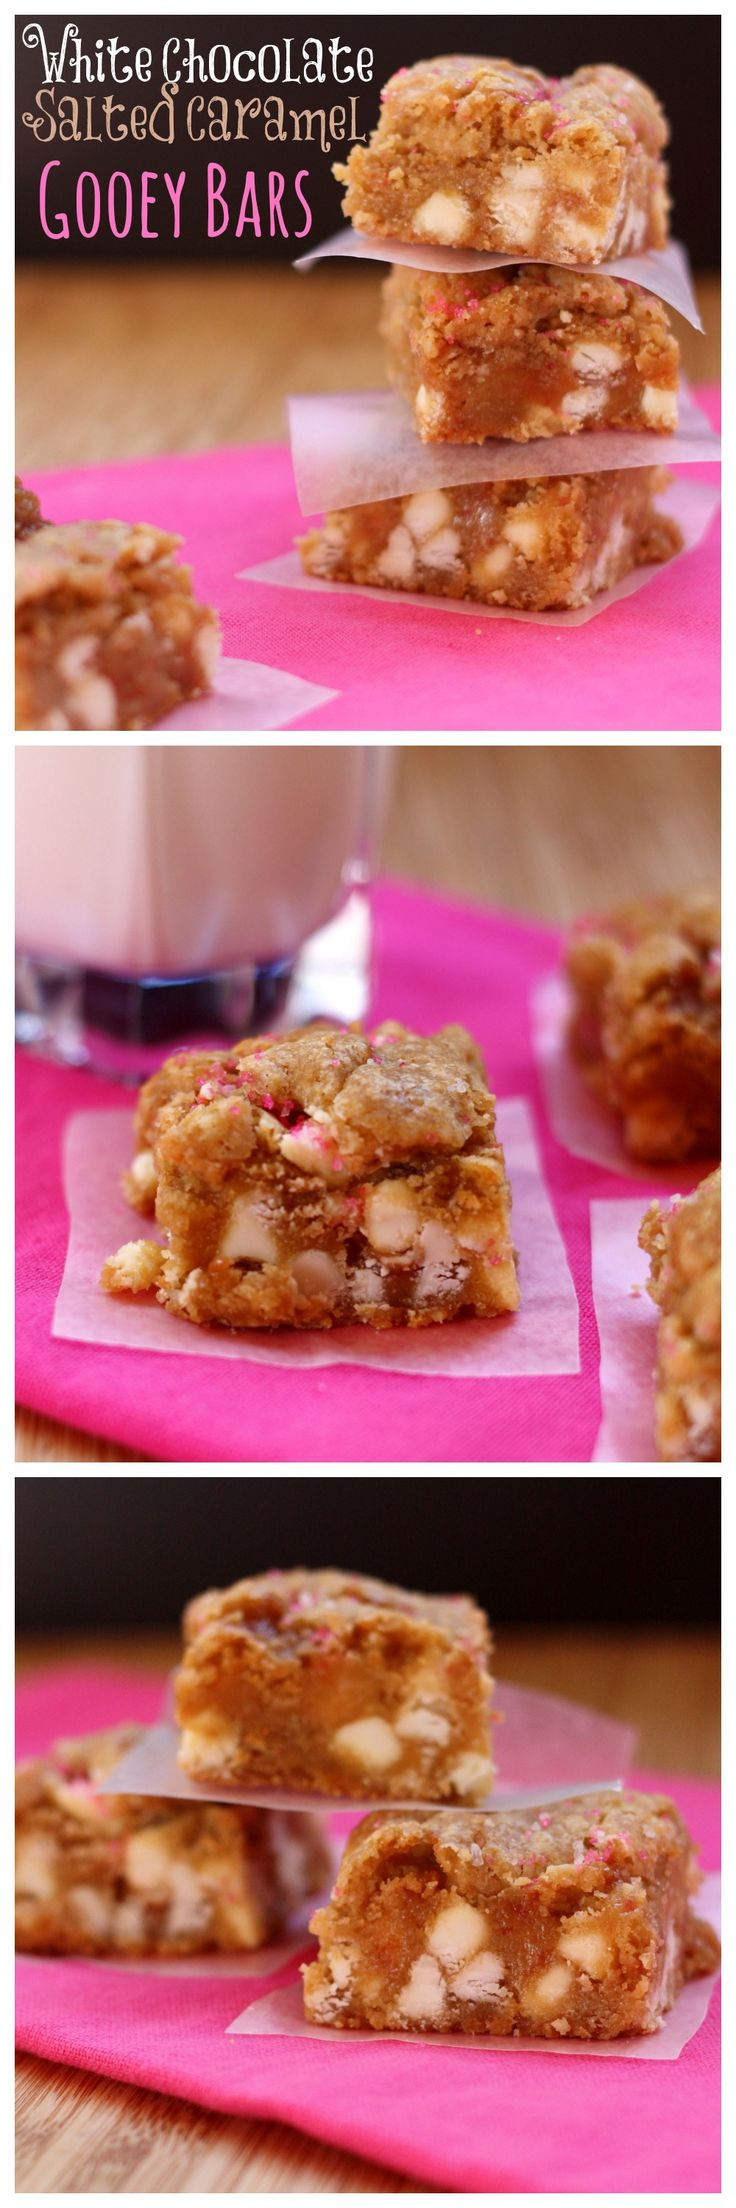 White Chocolate Salted Caramel Gooey Bars - the best blondies ever!   cupcakesandkalechips.com   #dessert #cookies